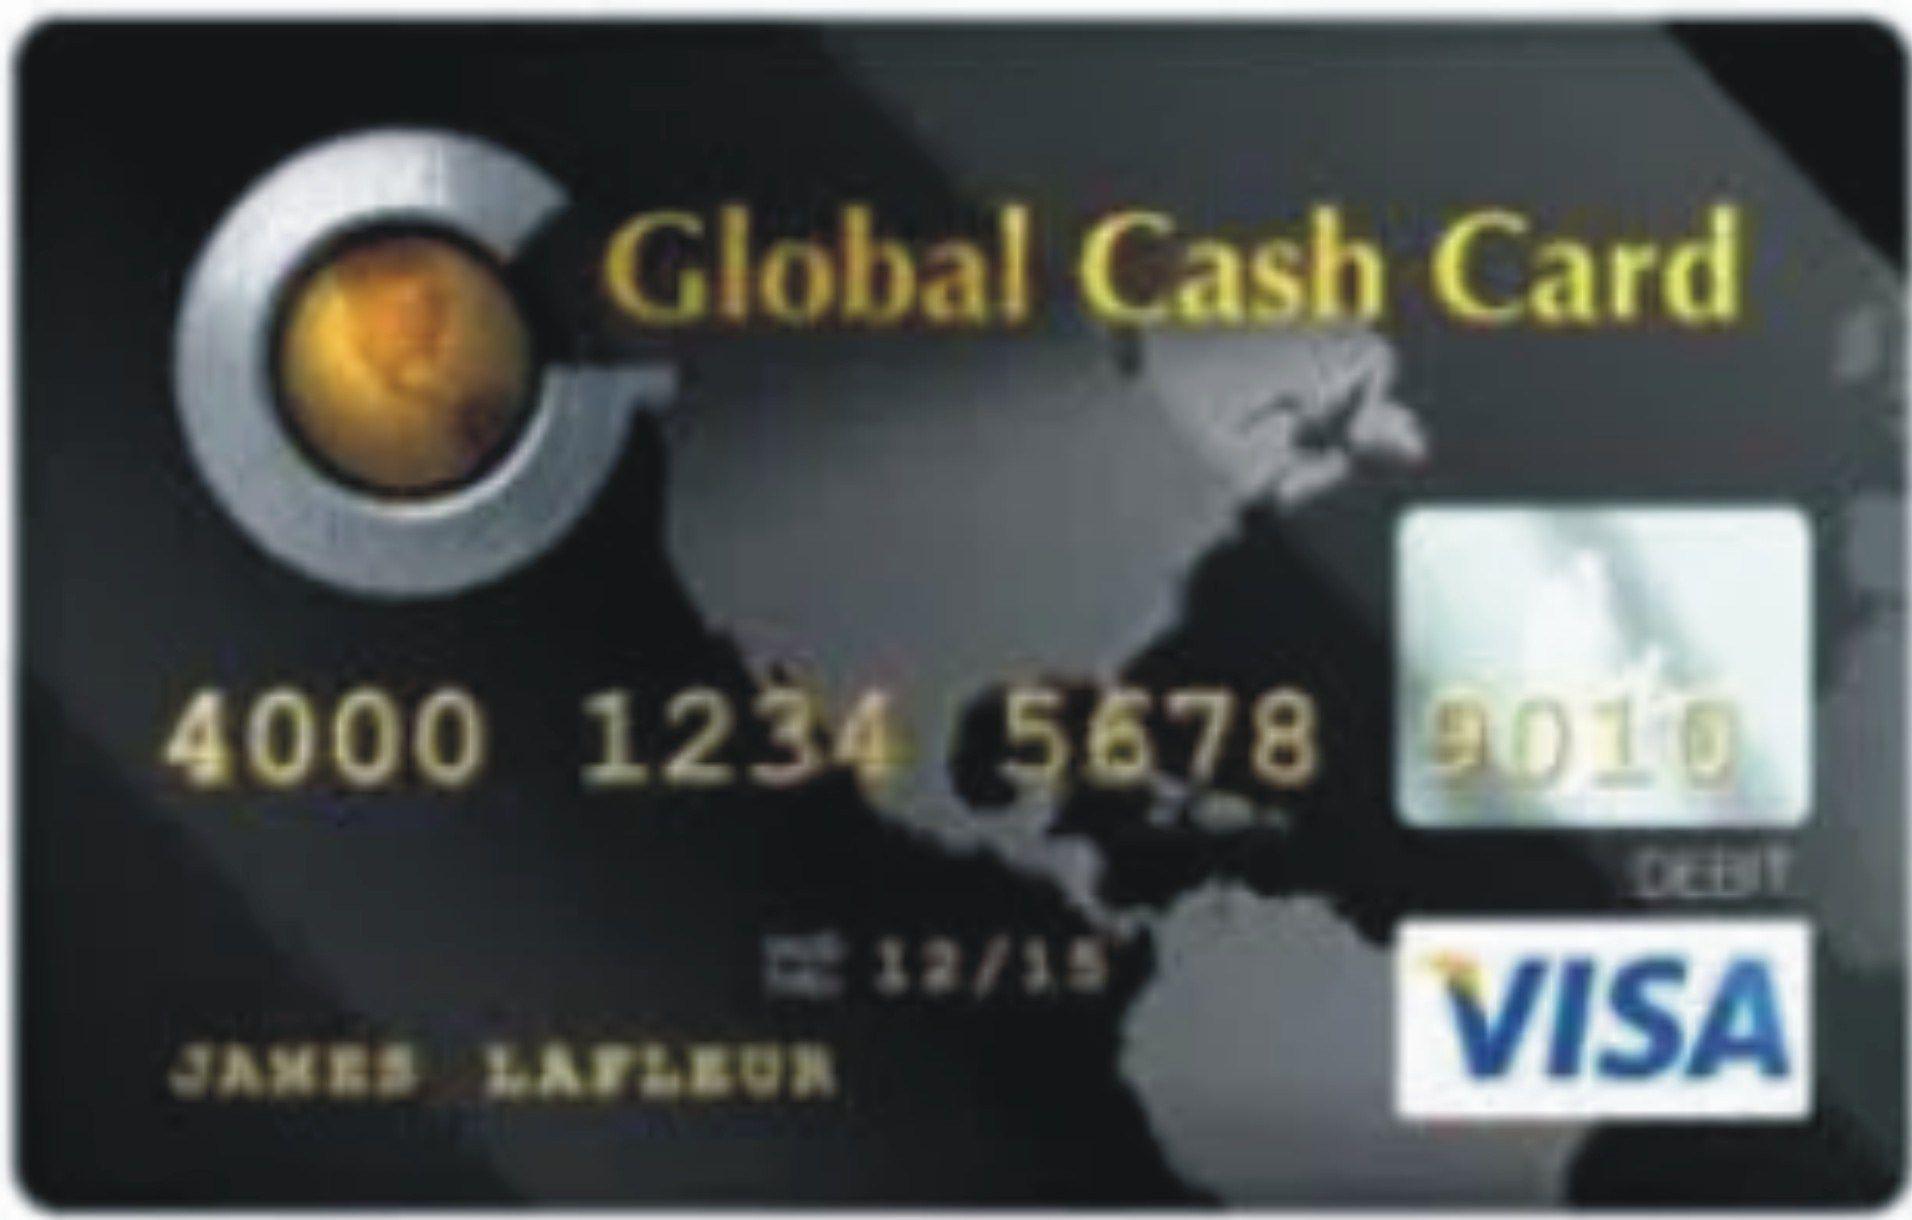 http://globalcashcard.com/activate